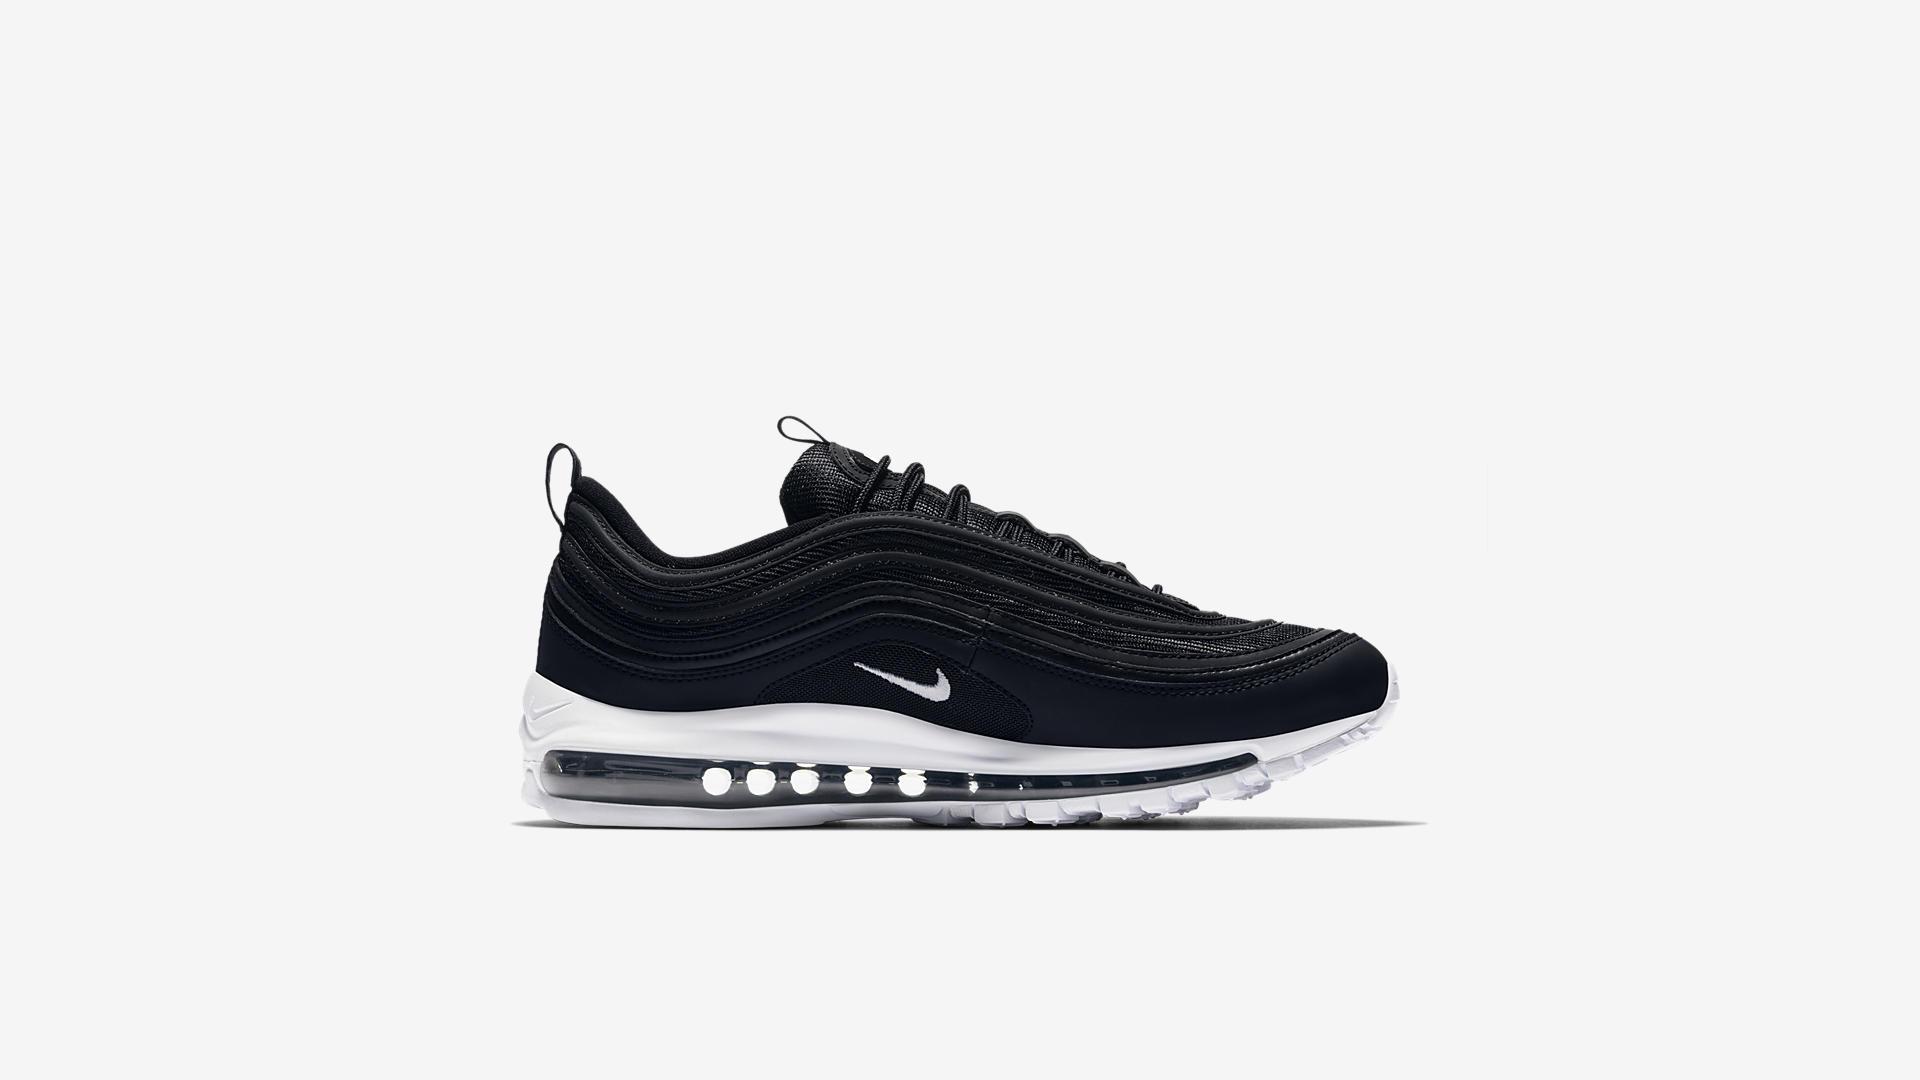 921826 001 Nike Air Max 97 Black White 4